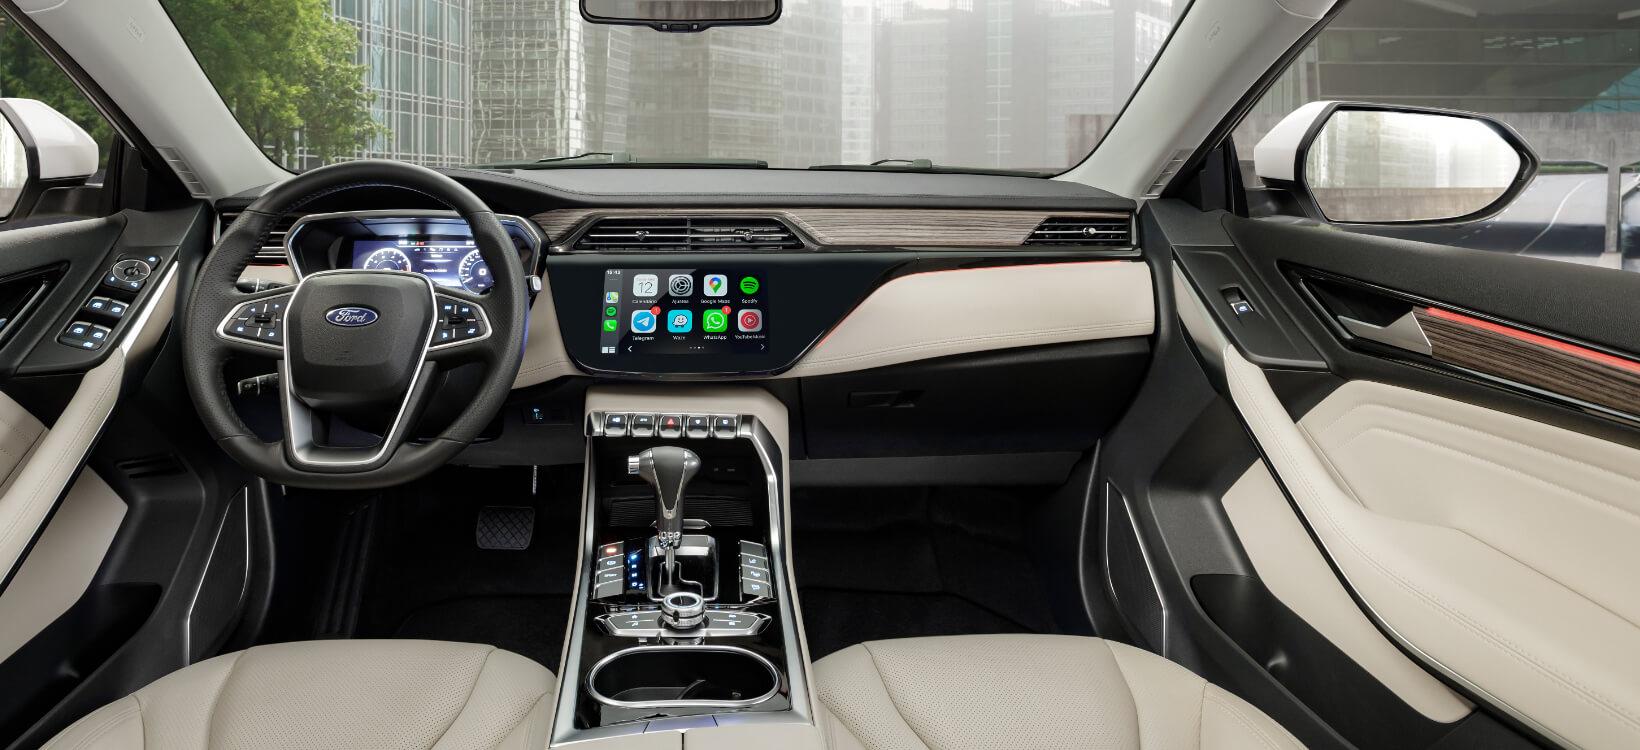 Foto de conectividade do novo Ford Territory 2021